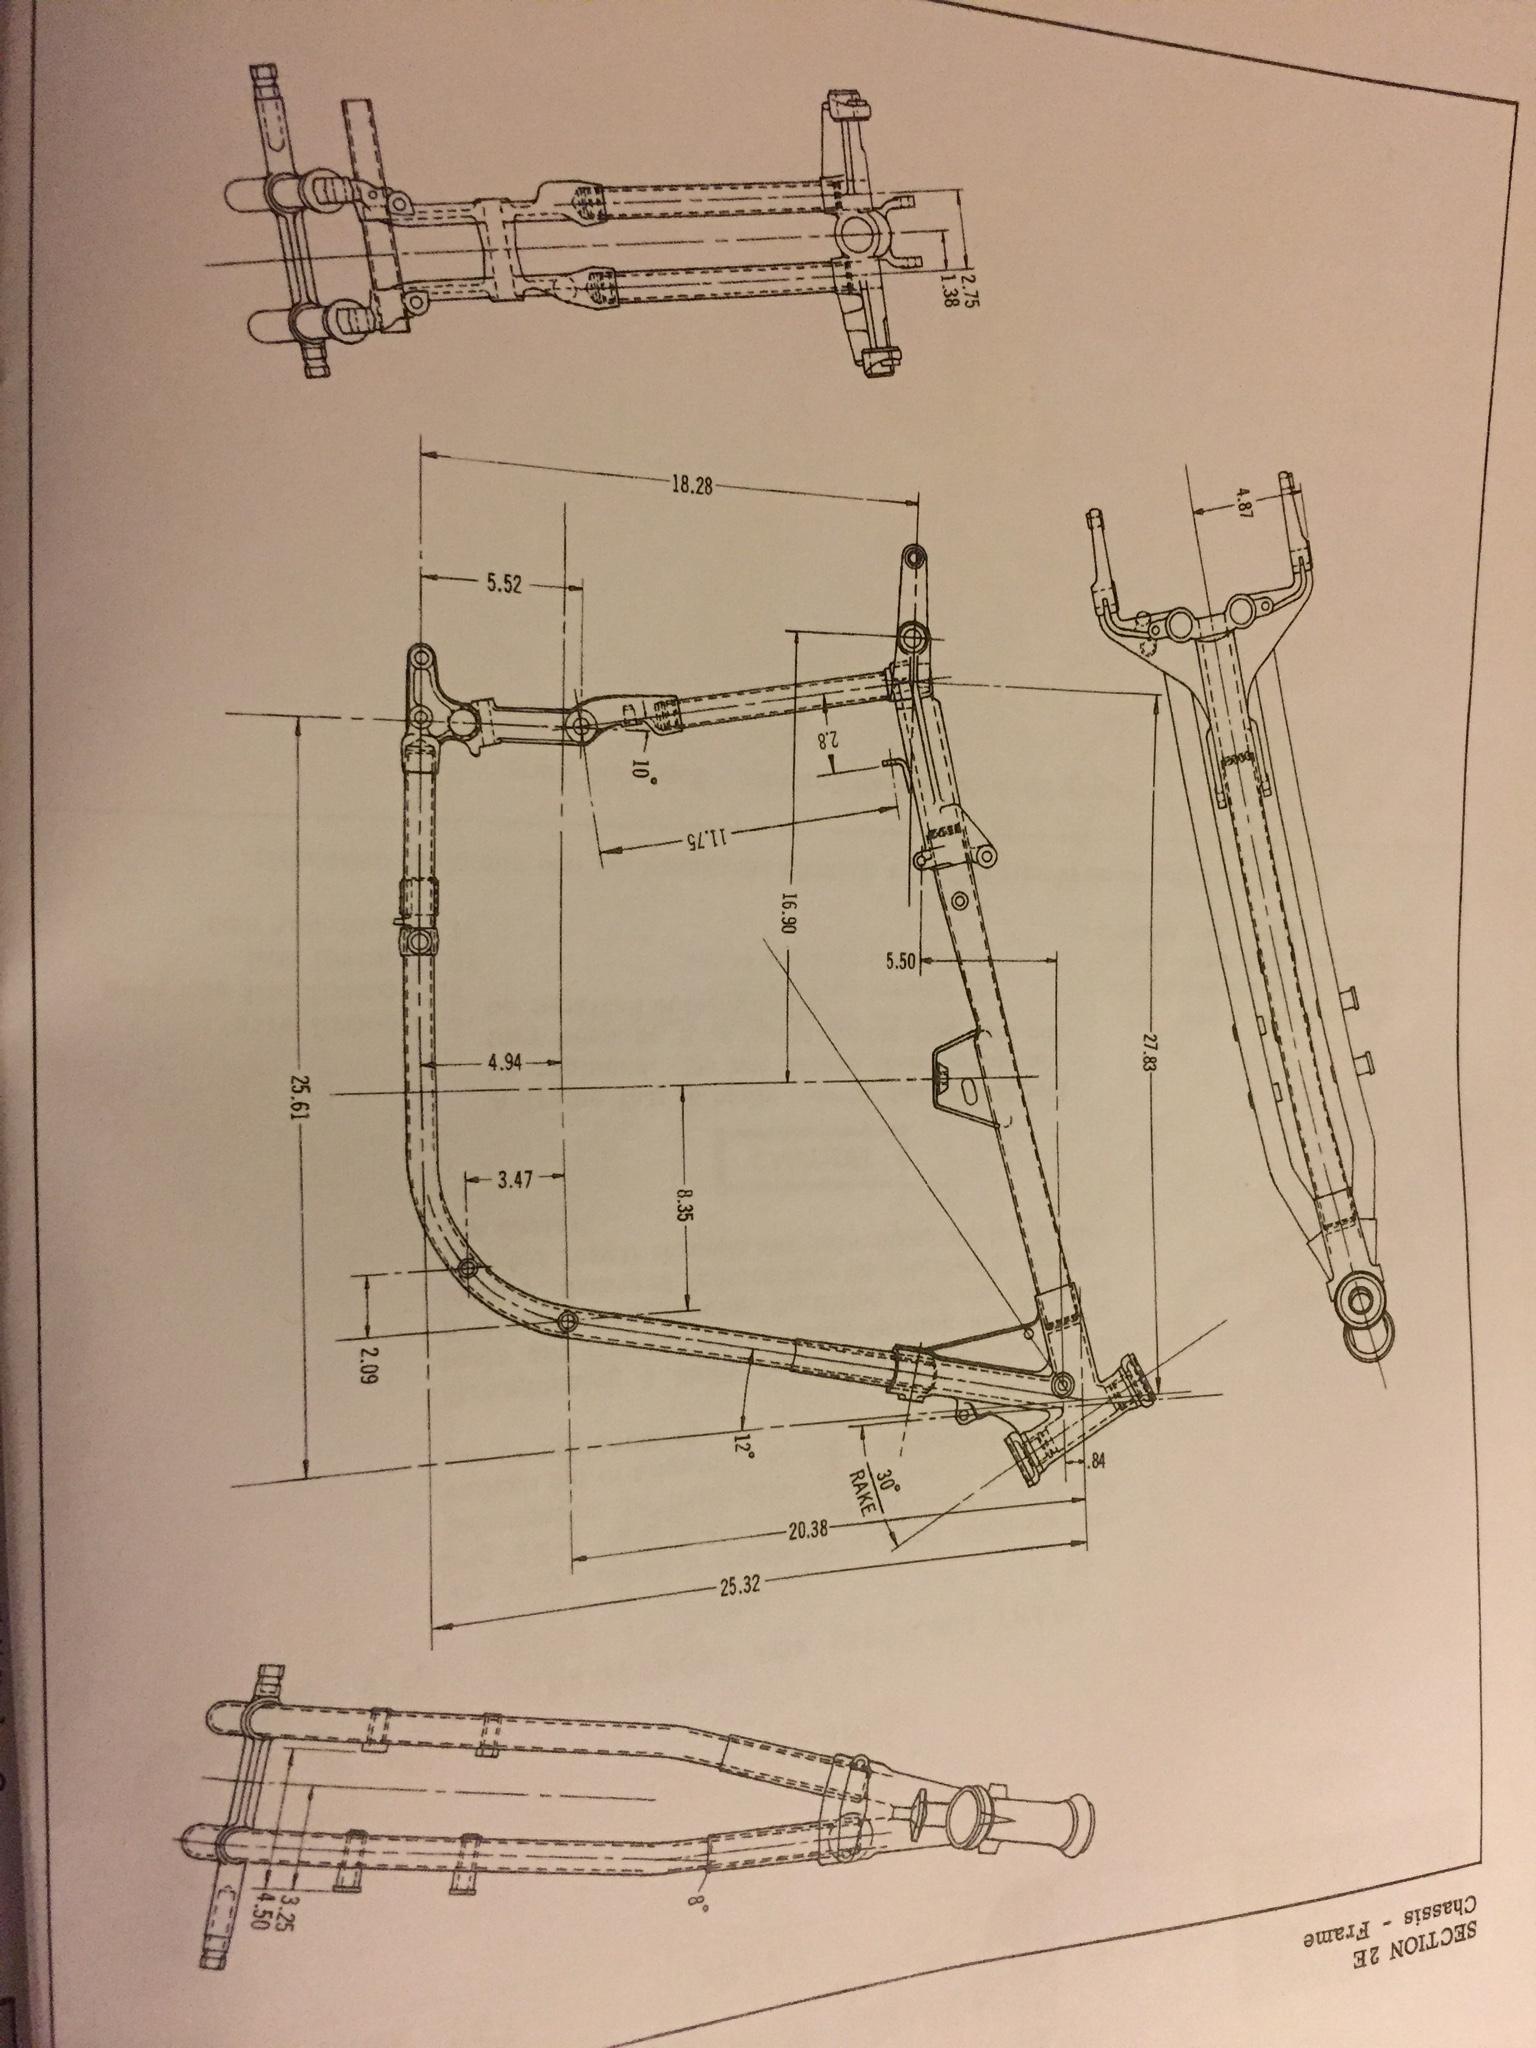 Tolle 1980 Sportster Schaltplan Fotos - Schaltplan Serie Circuit ...